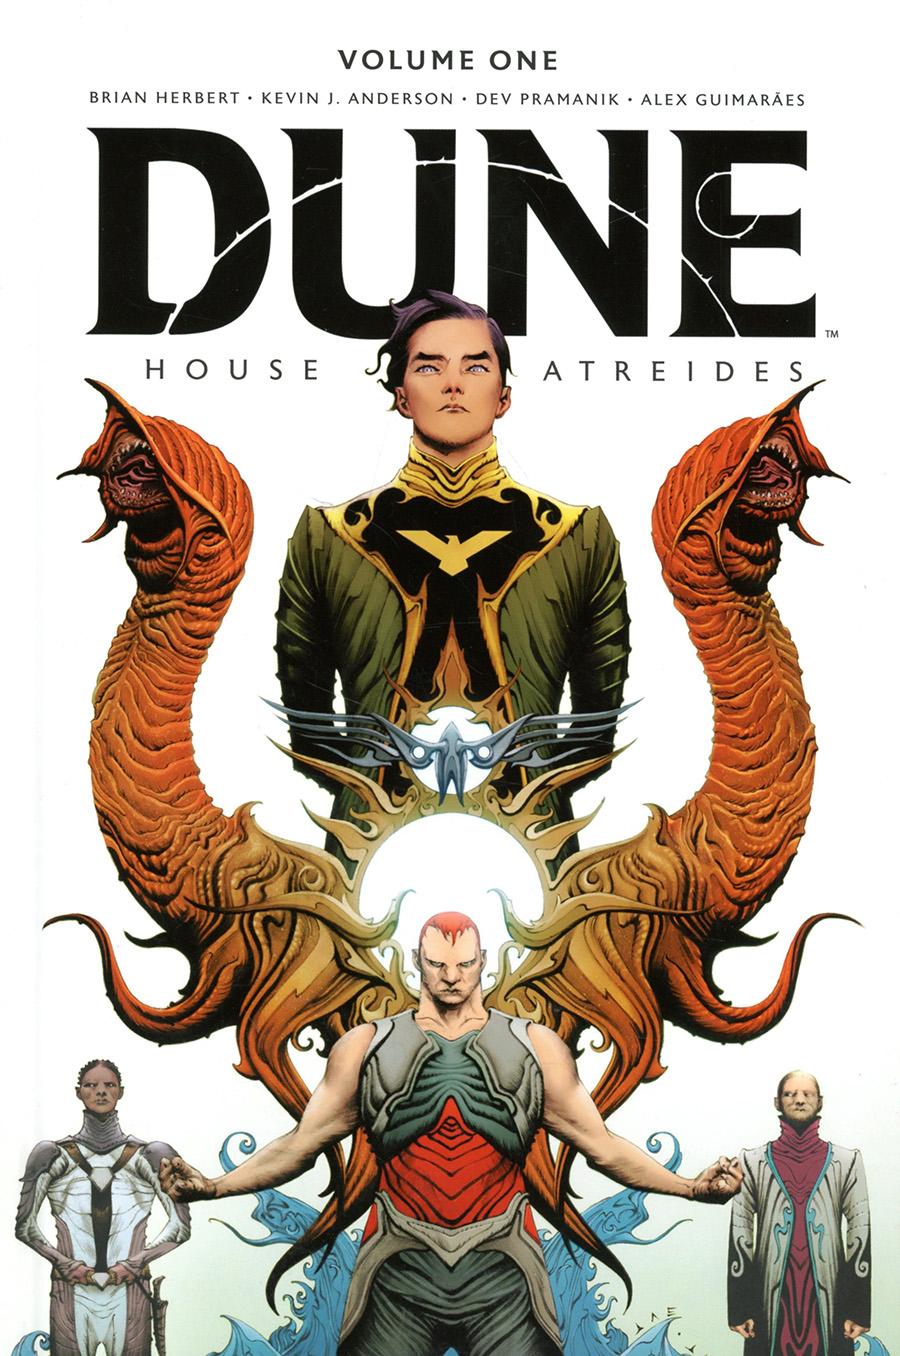 Dune House Atreides Vol 1 HC